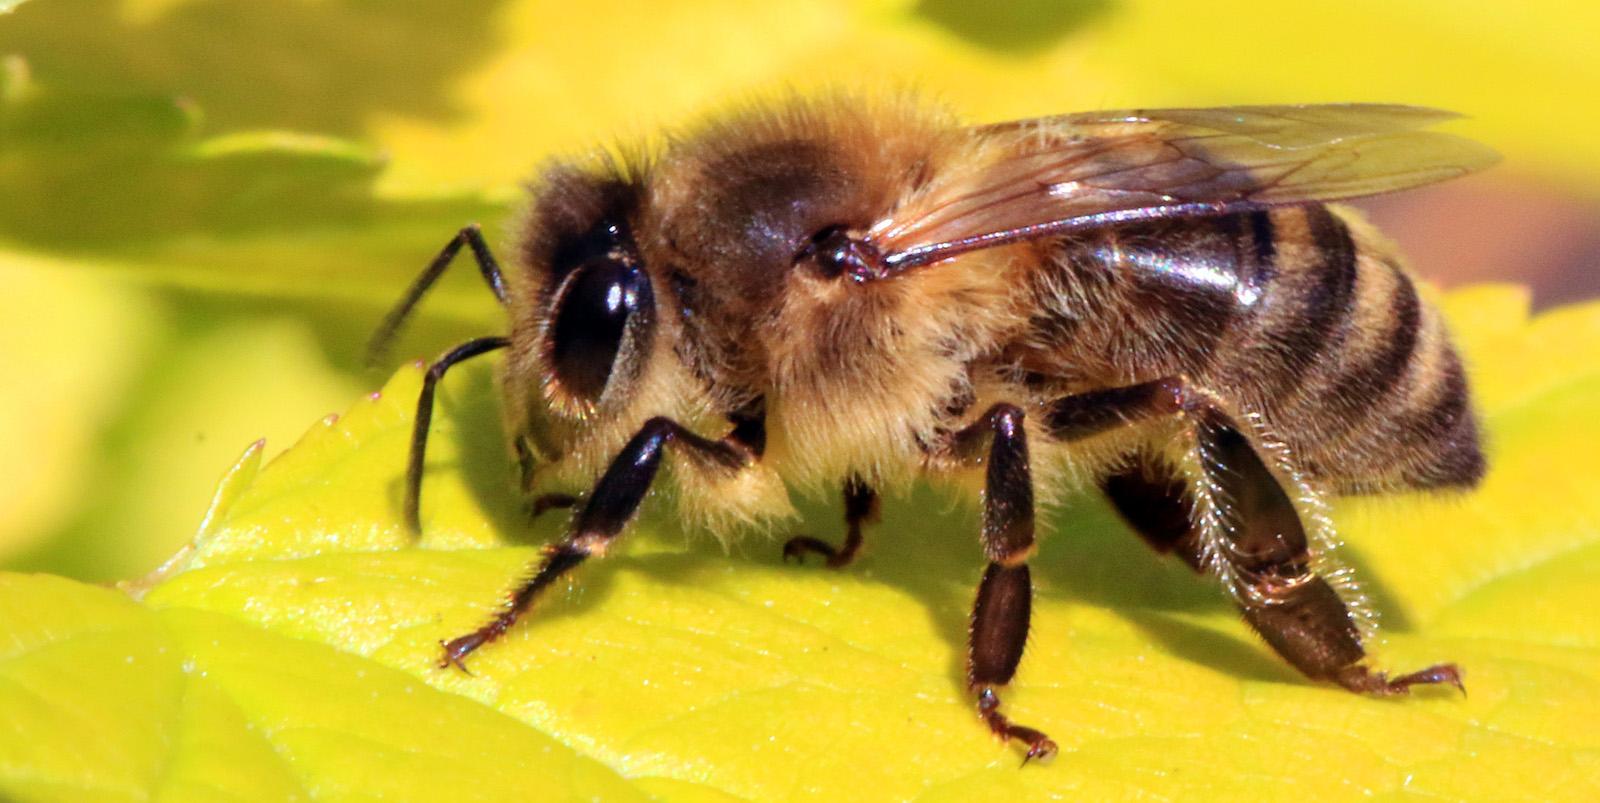 Honey-bee.88f638390b7647f7ba5d5b8e9b11a909.jpg